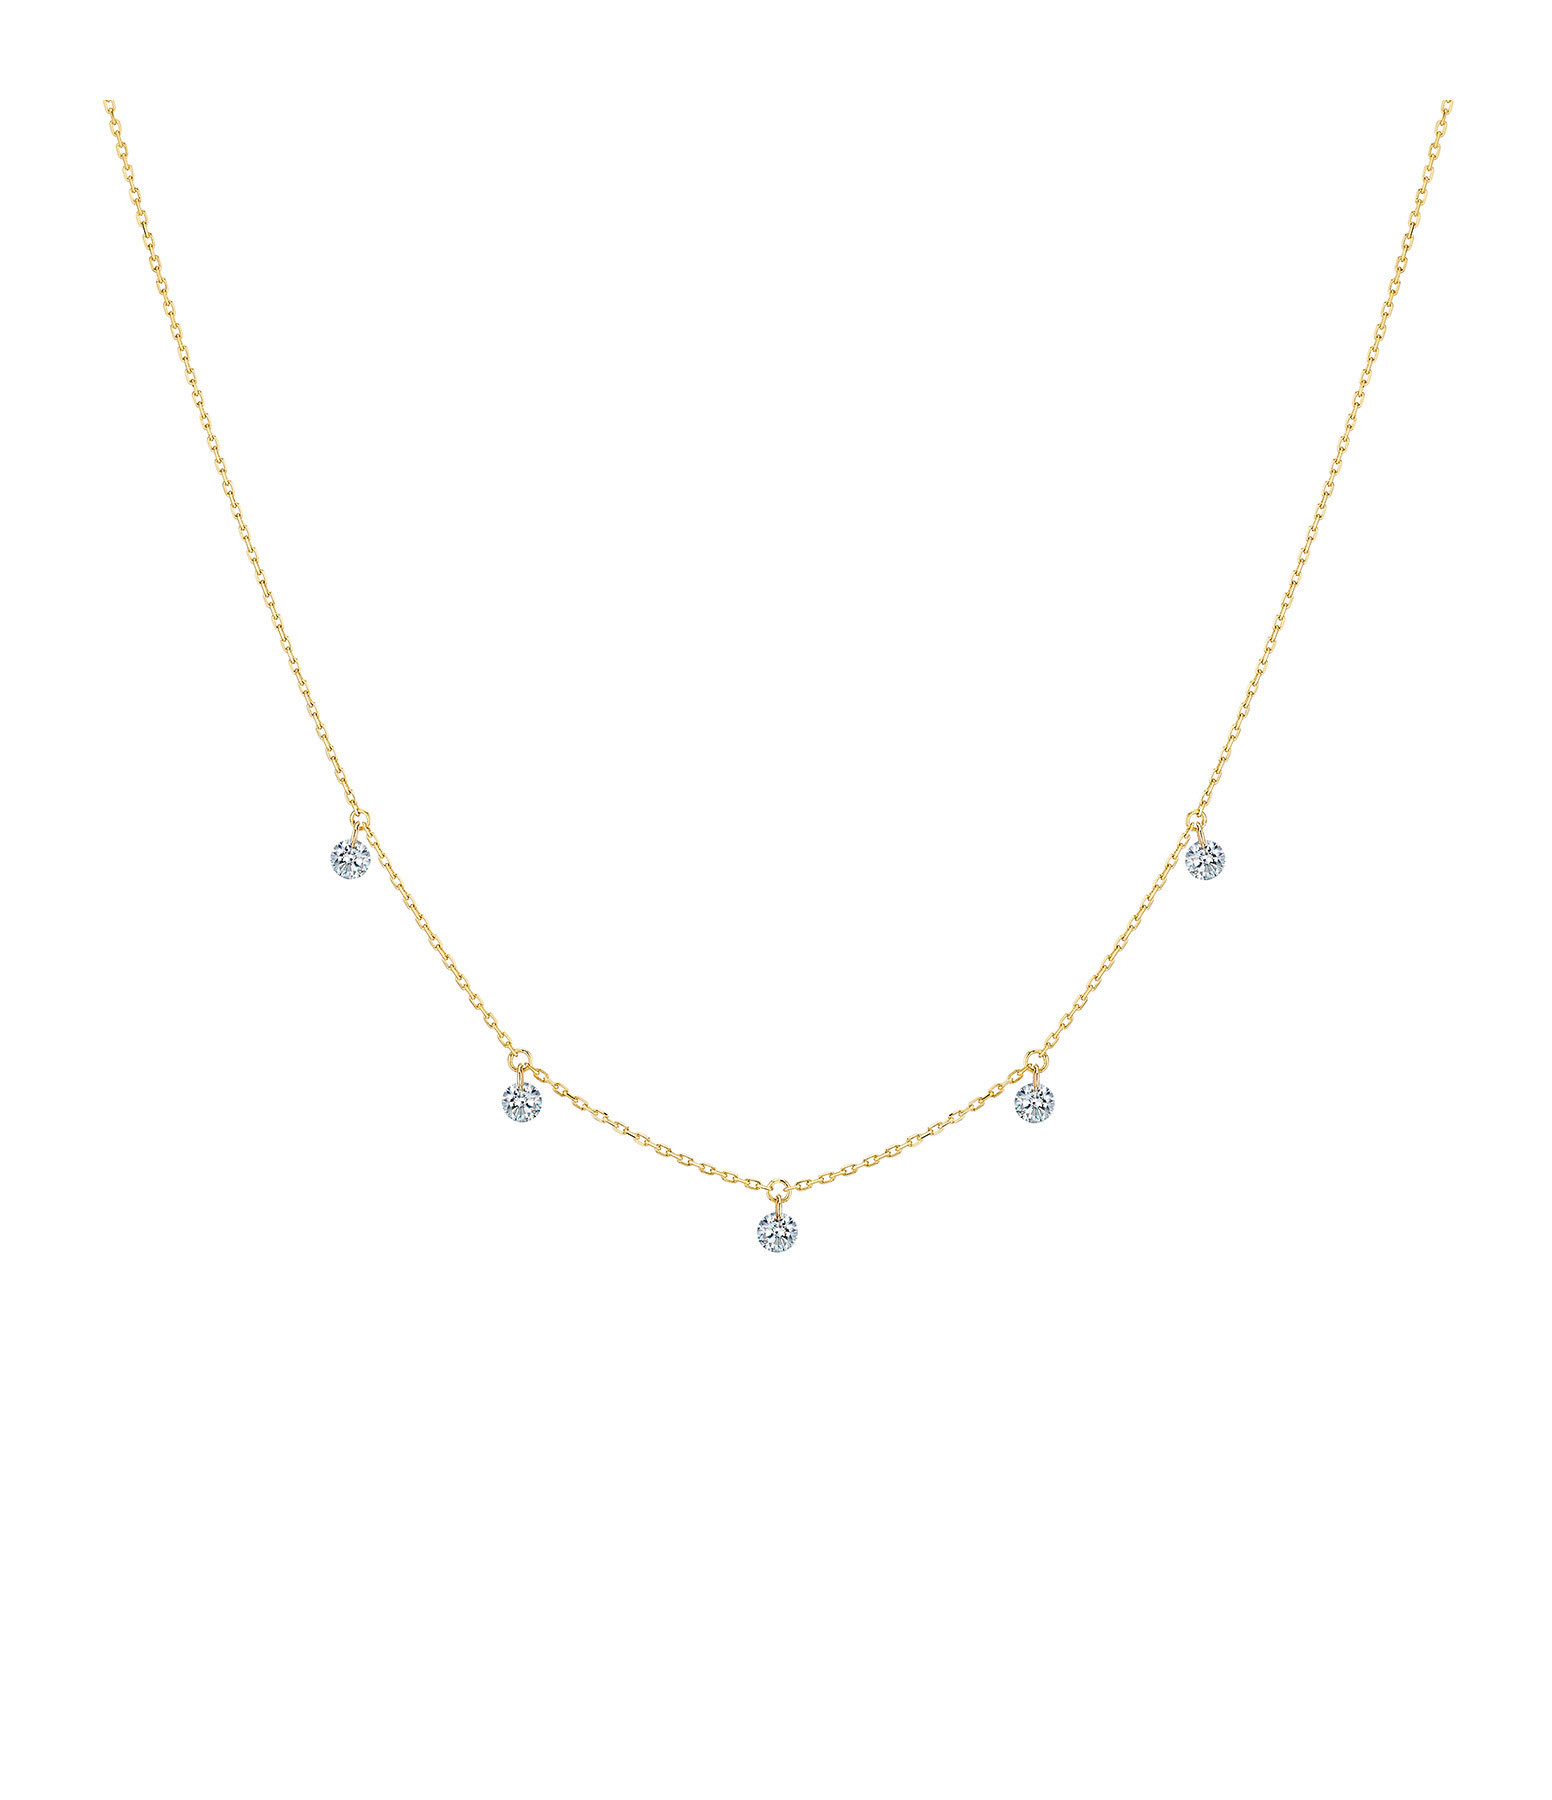 LA BRUNE & LA BLONDE - Collier 360° 5 Diamants Brillants Or Jaune